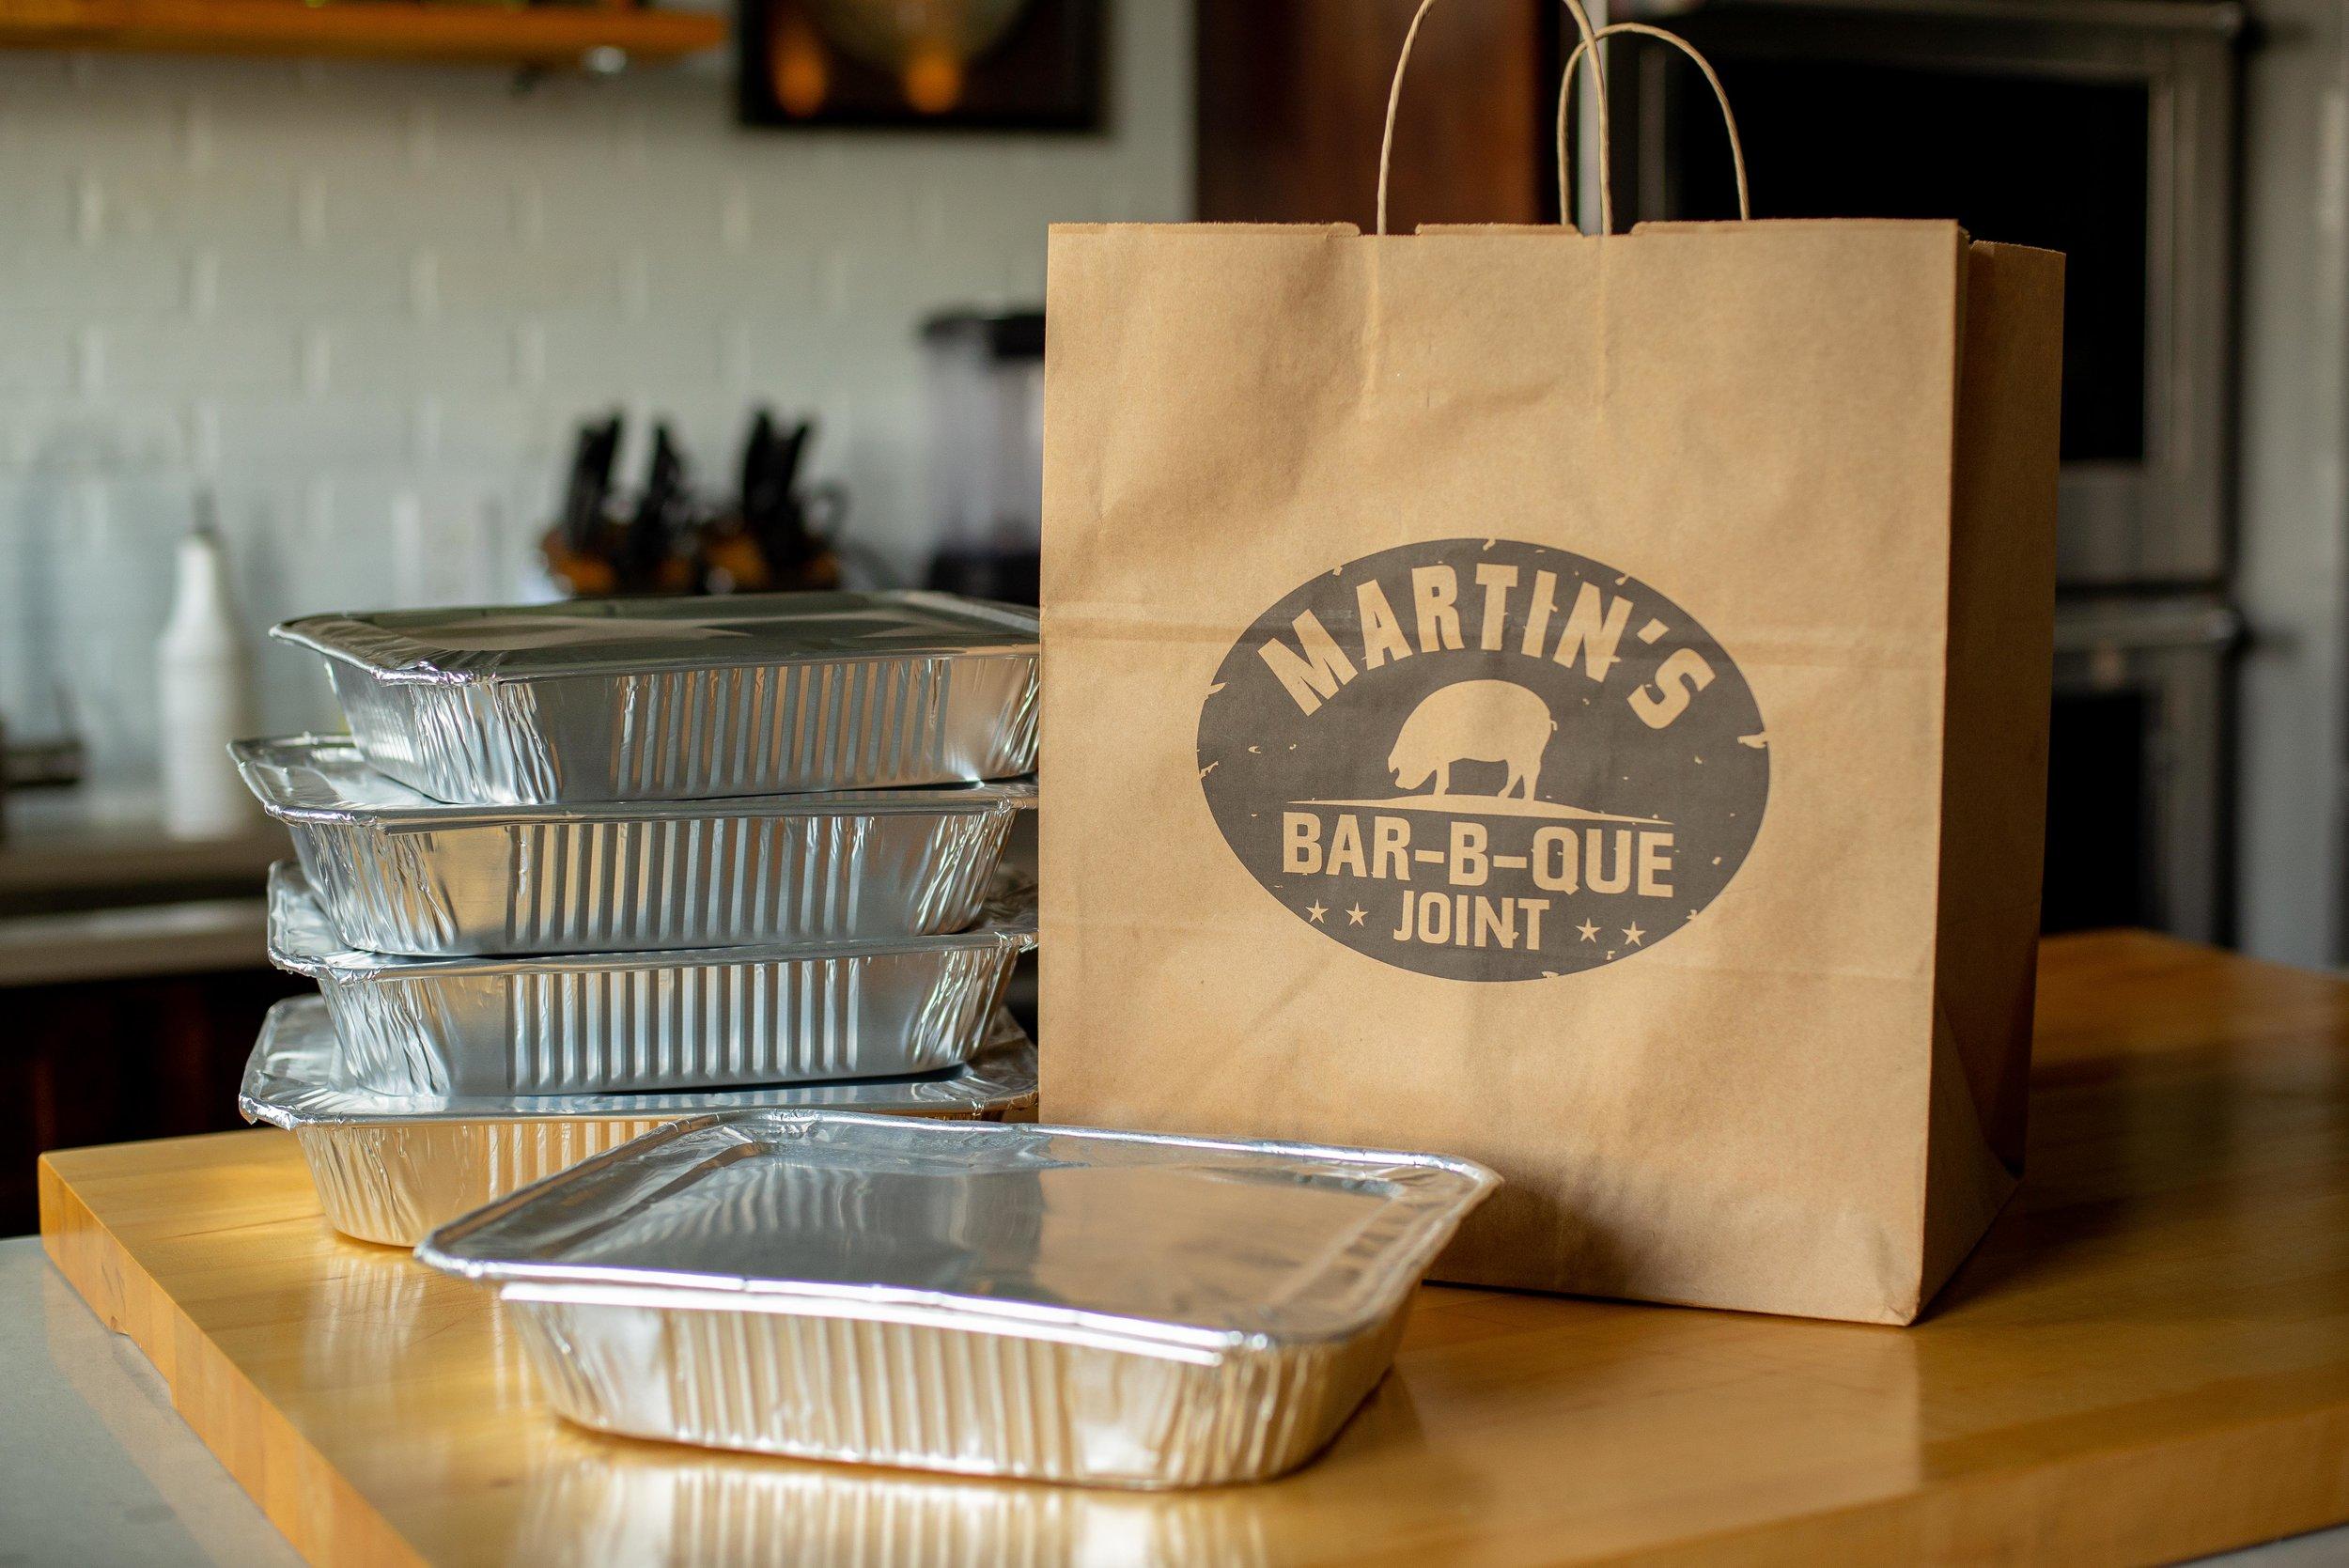 2018-08-14 Martin's catering-9969.jpg